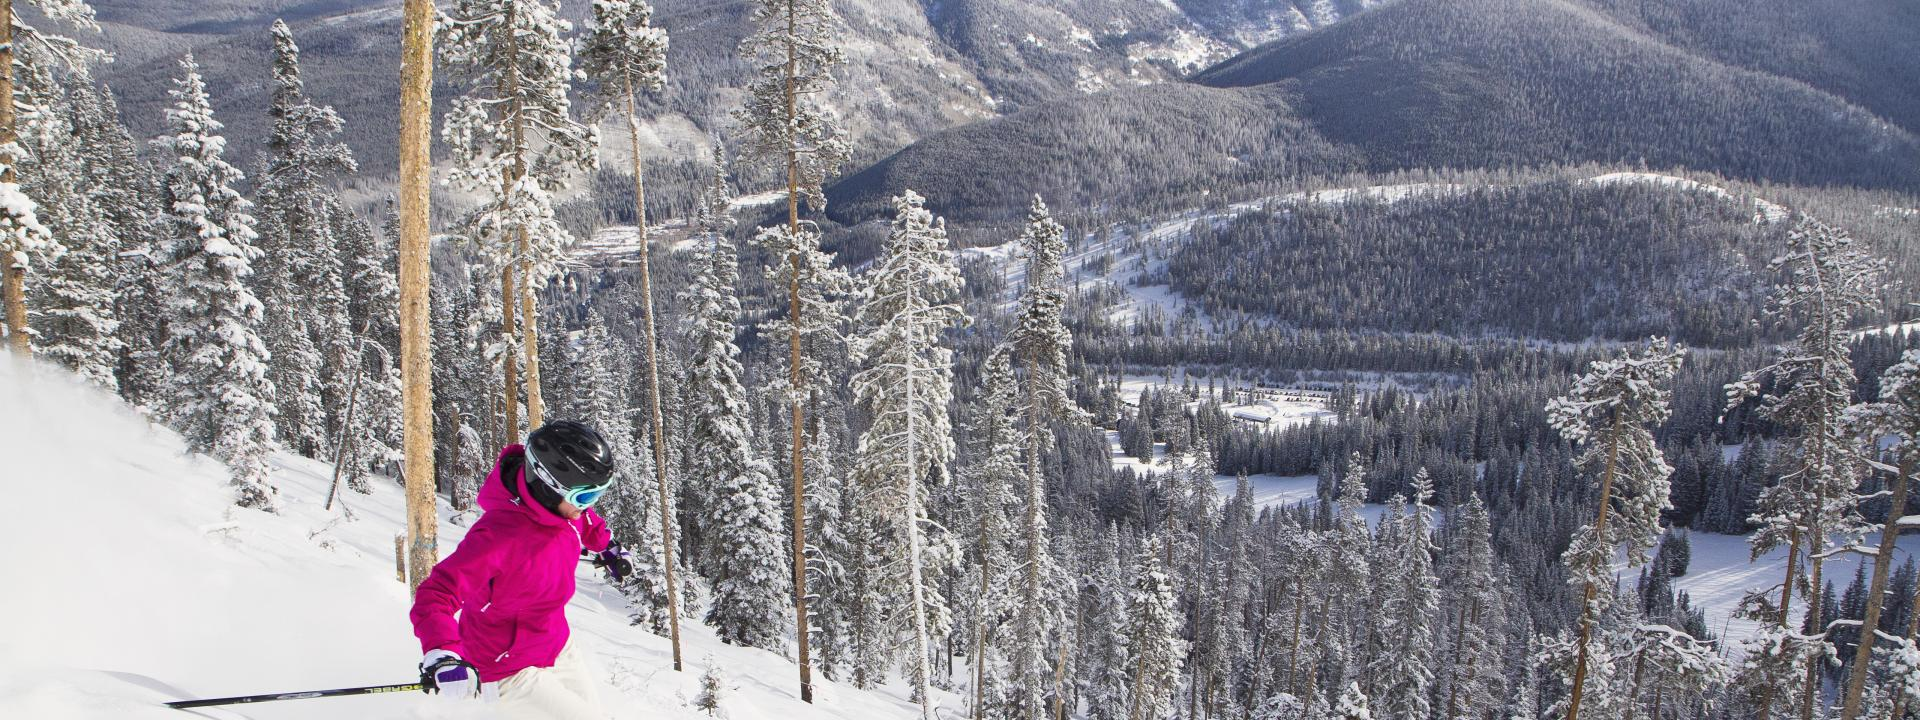 Skiing at Winter Park Resort with science views and fresh powder